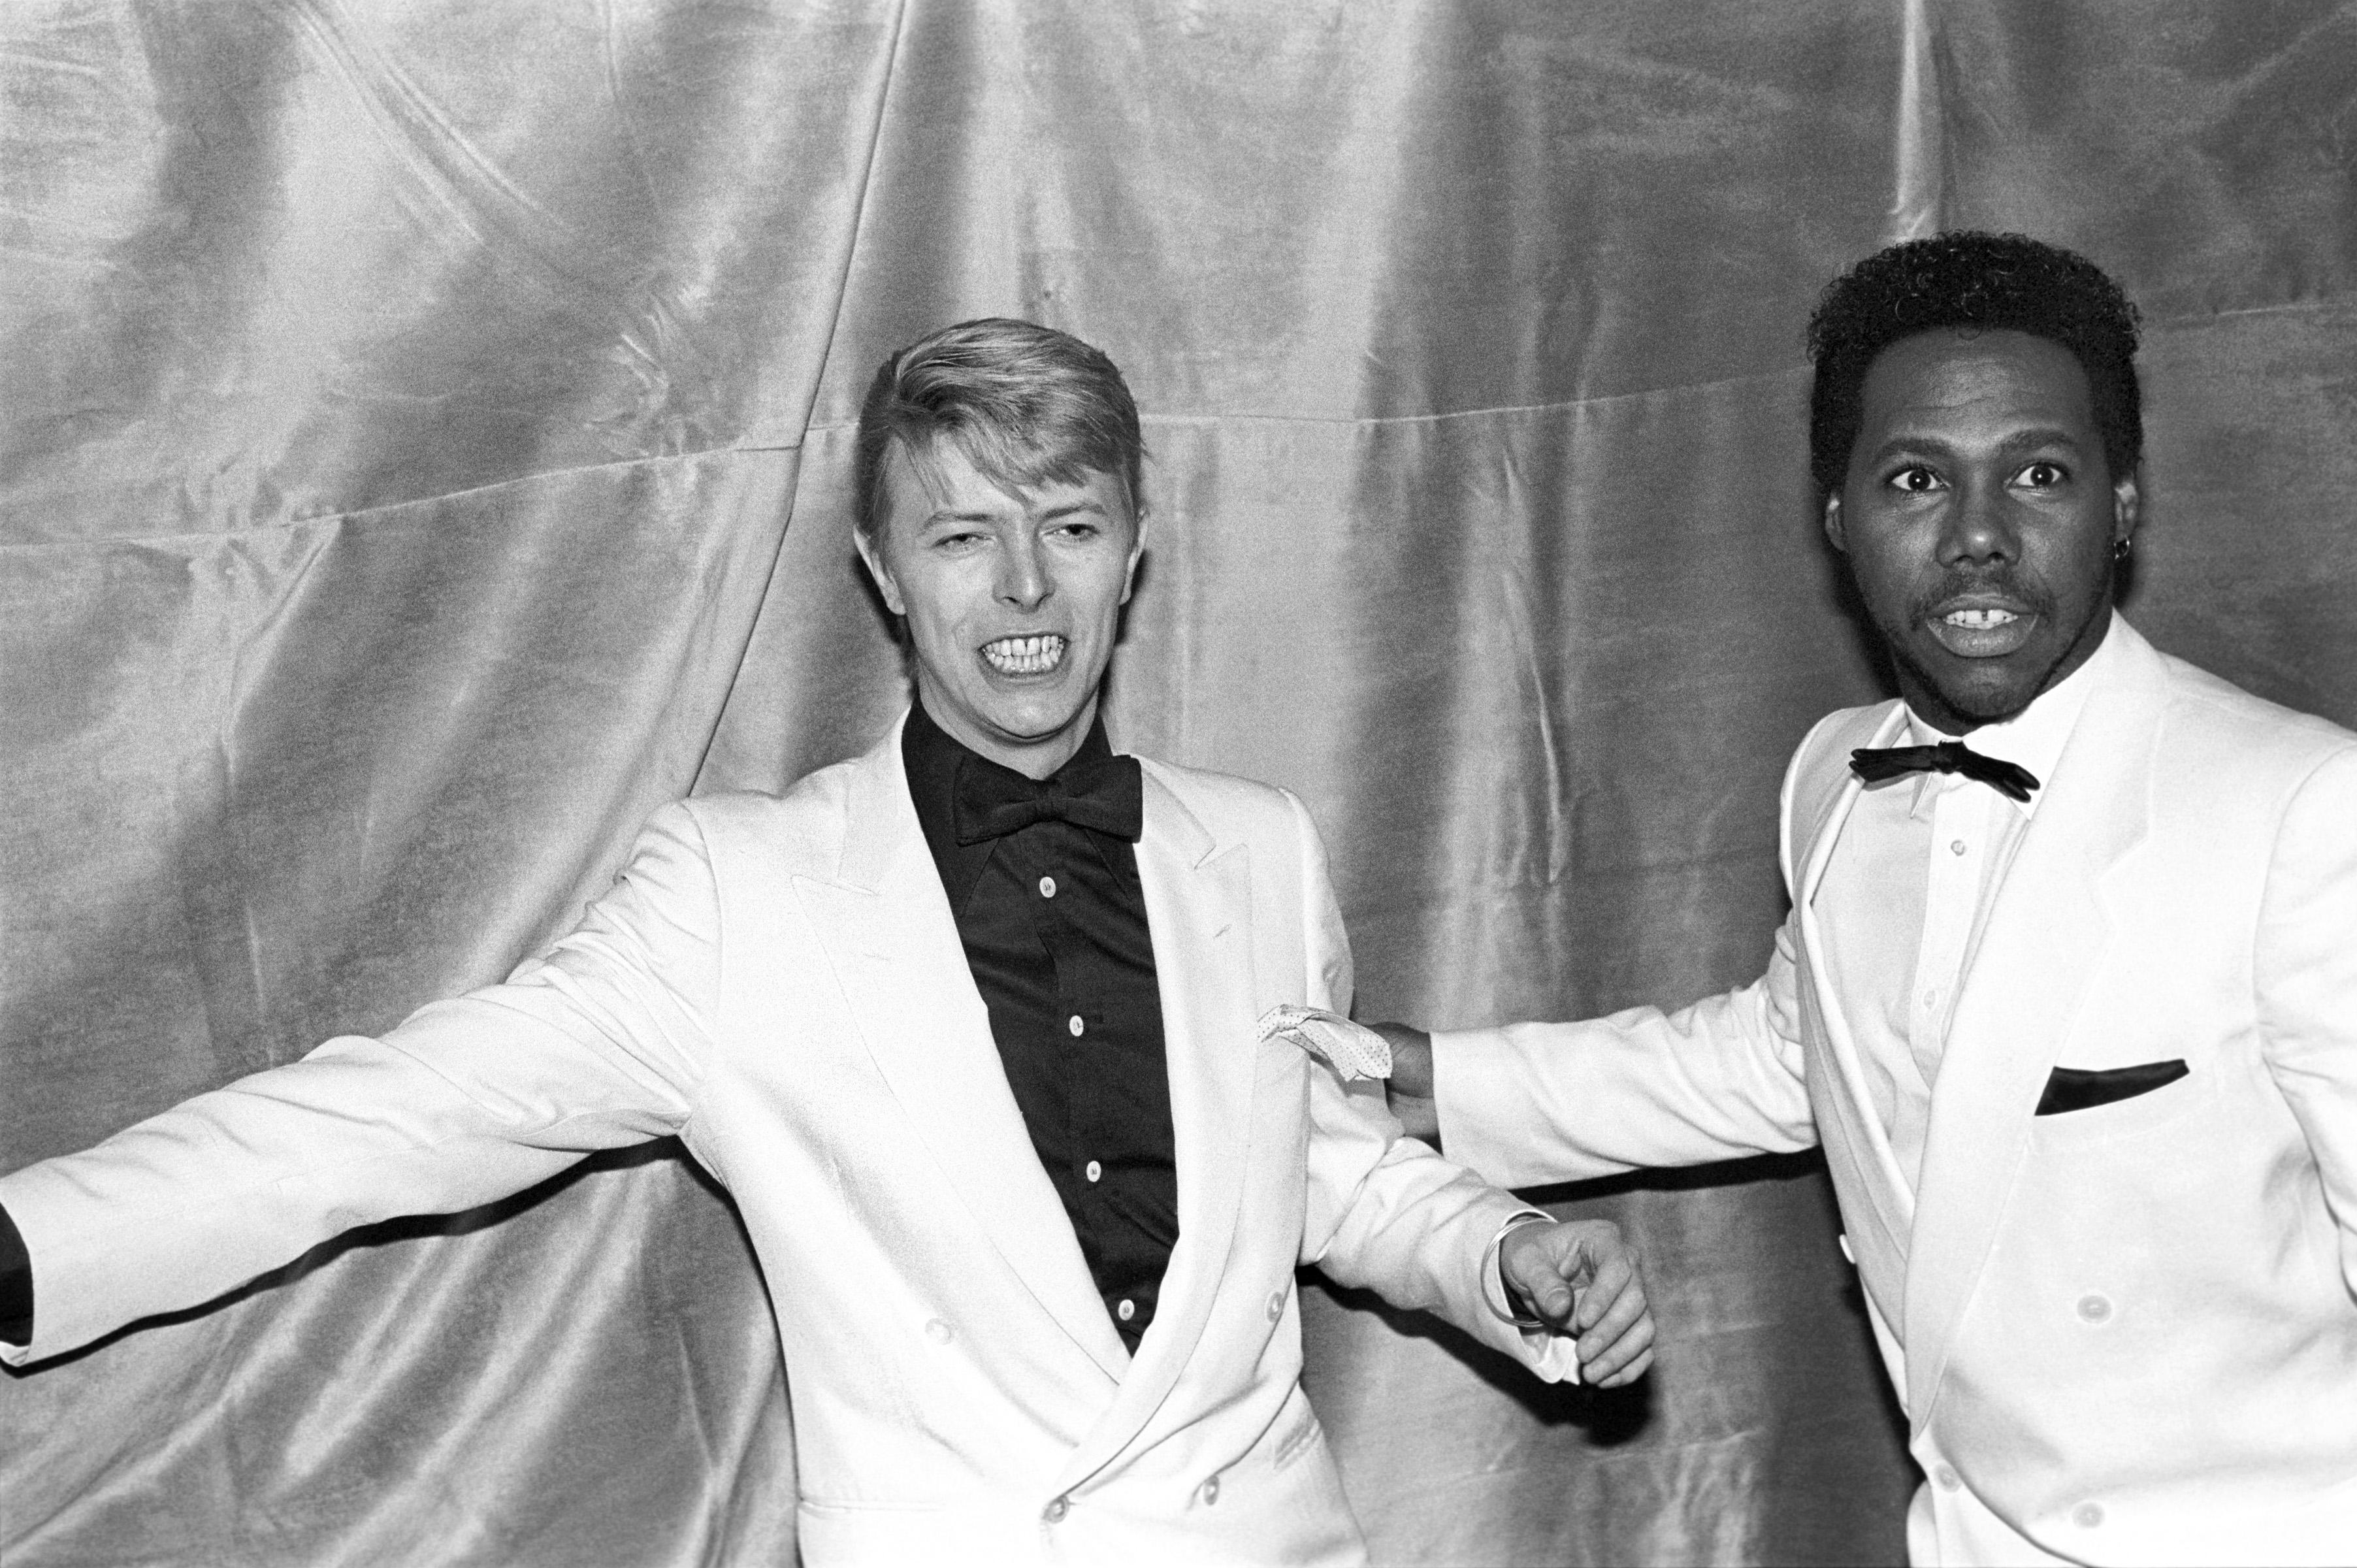 <b>Nile Rodgers</b>, <i>Let's Dance</i>, 1983.